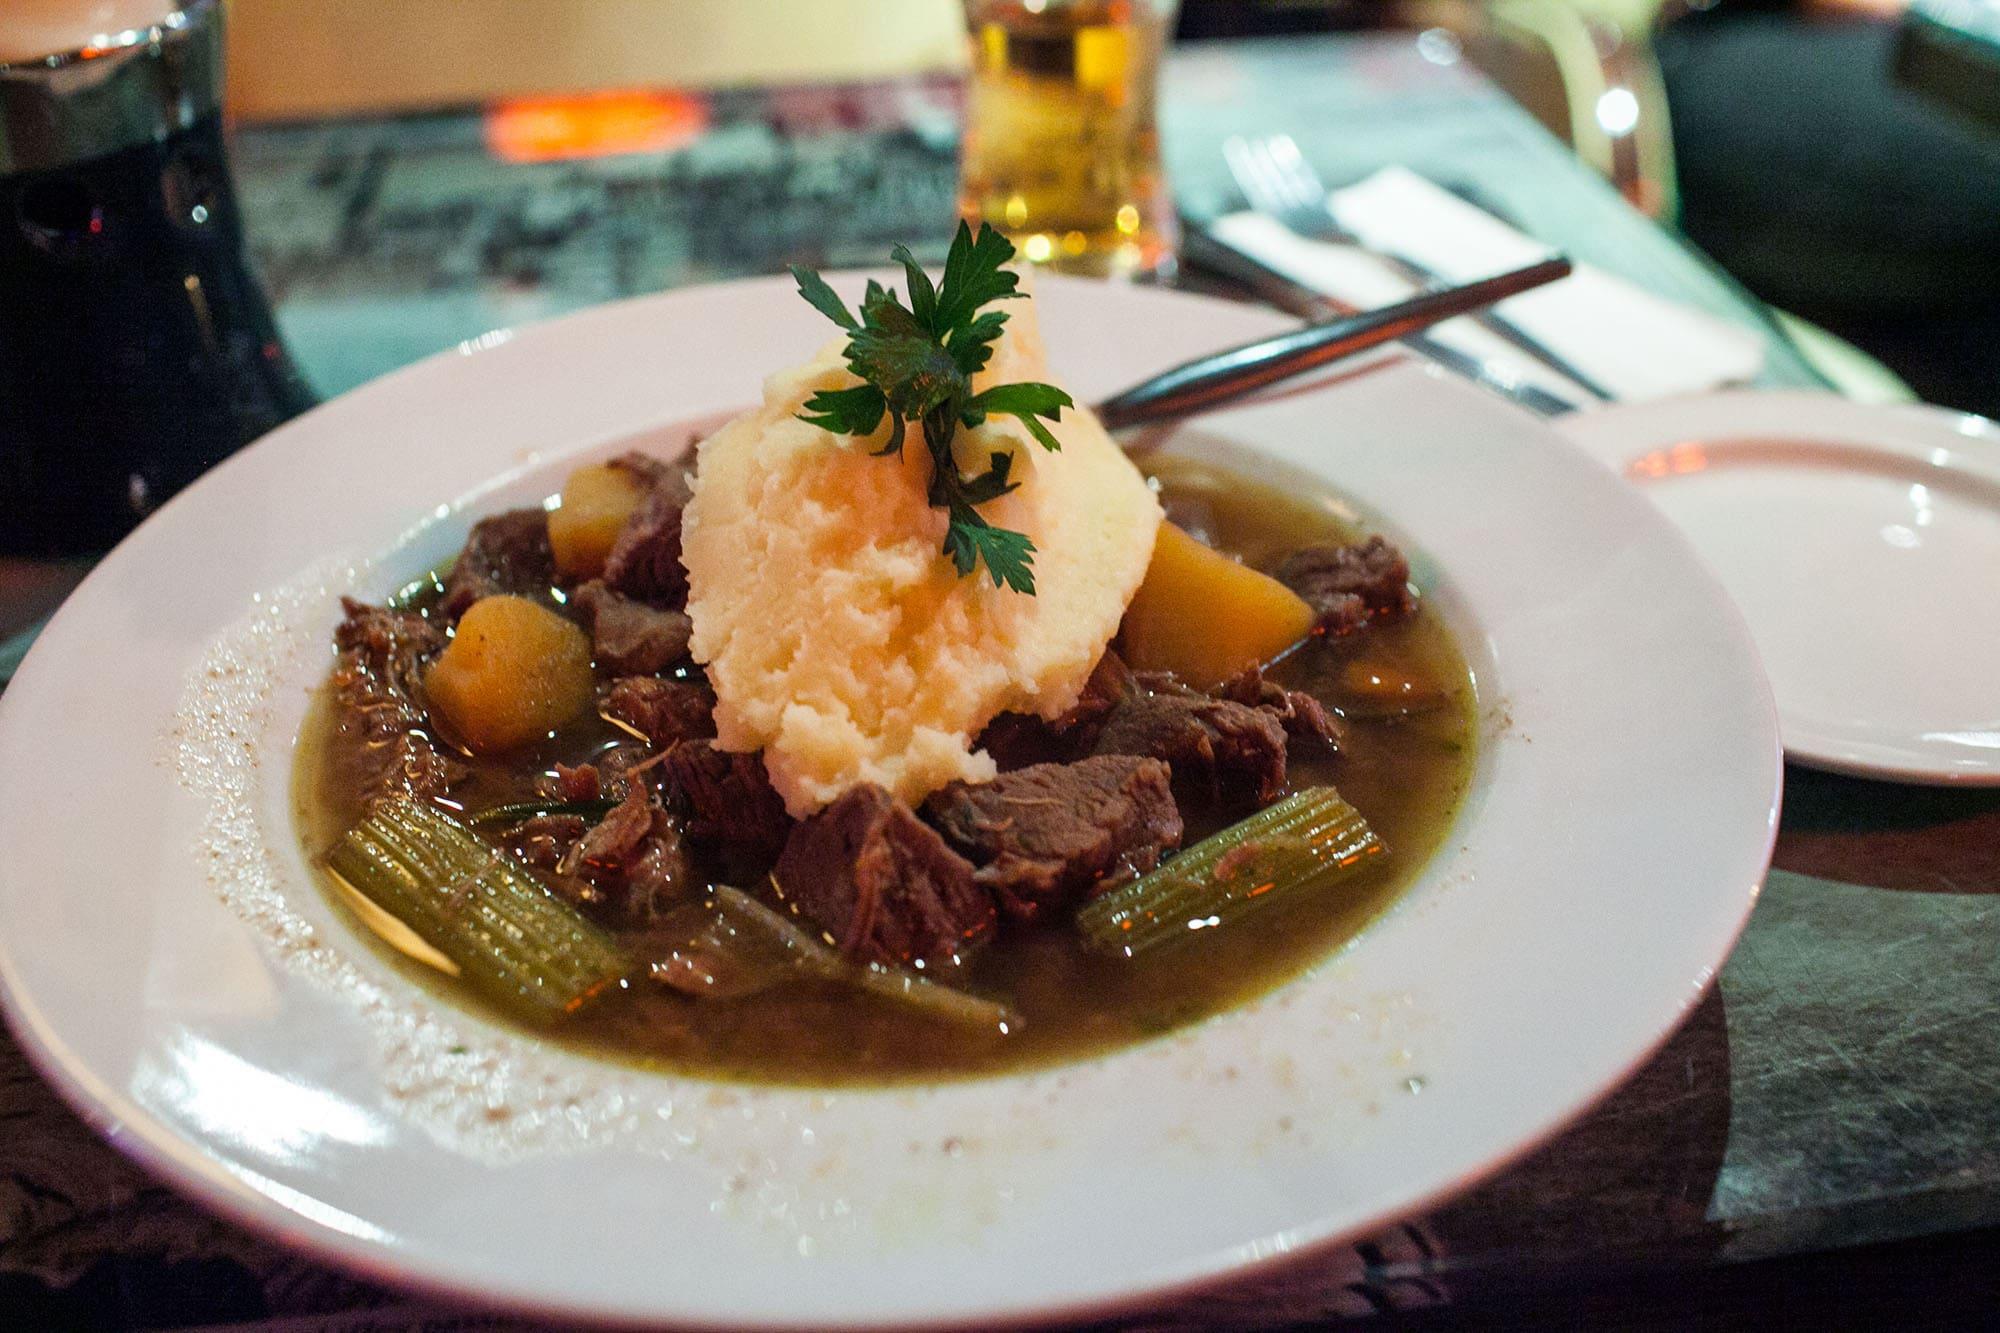 Beef stew - Dublin, Ireland